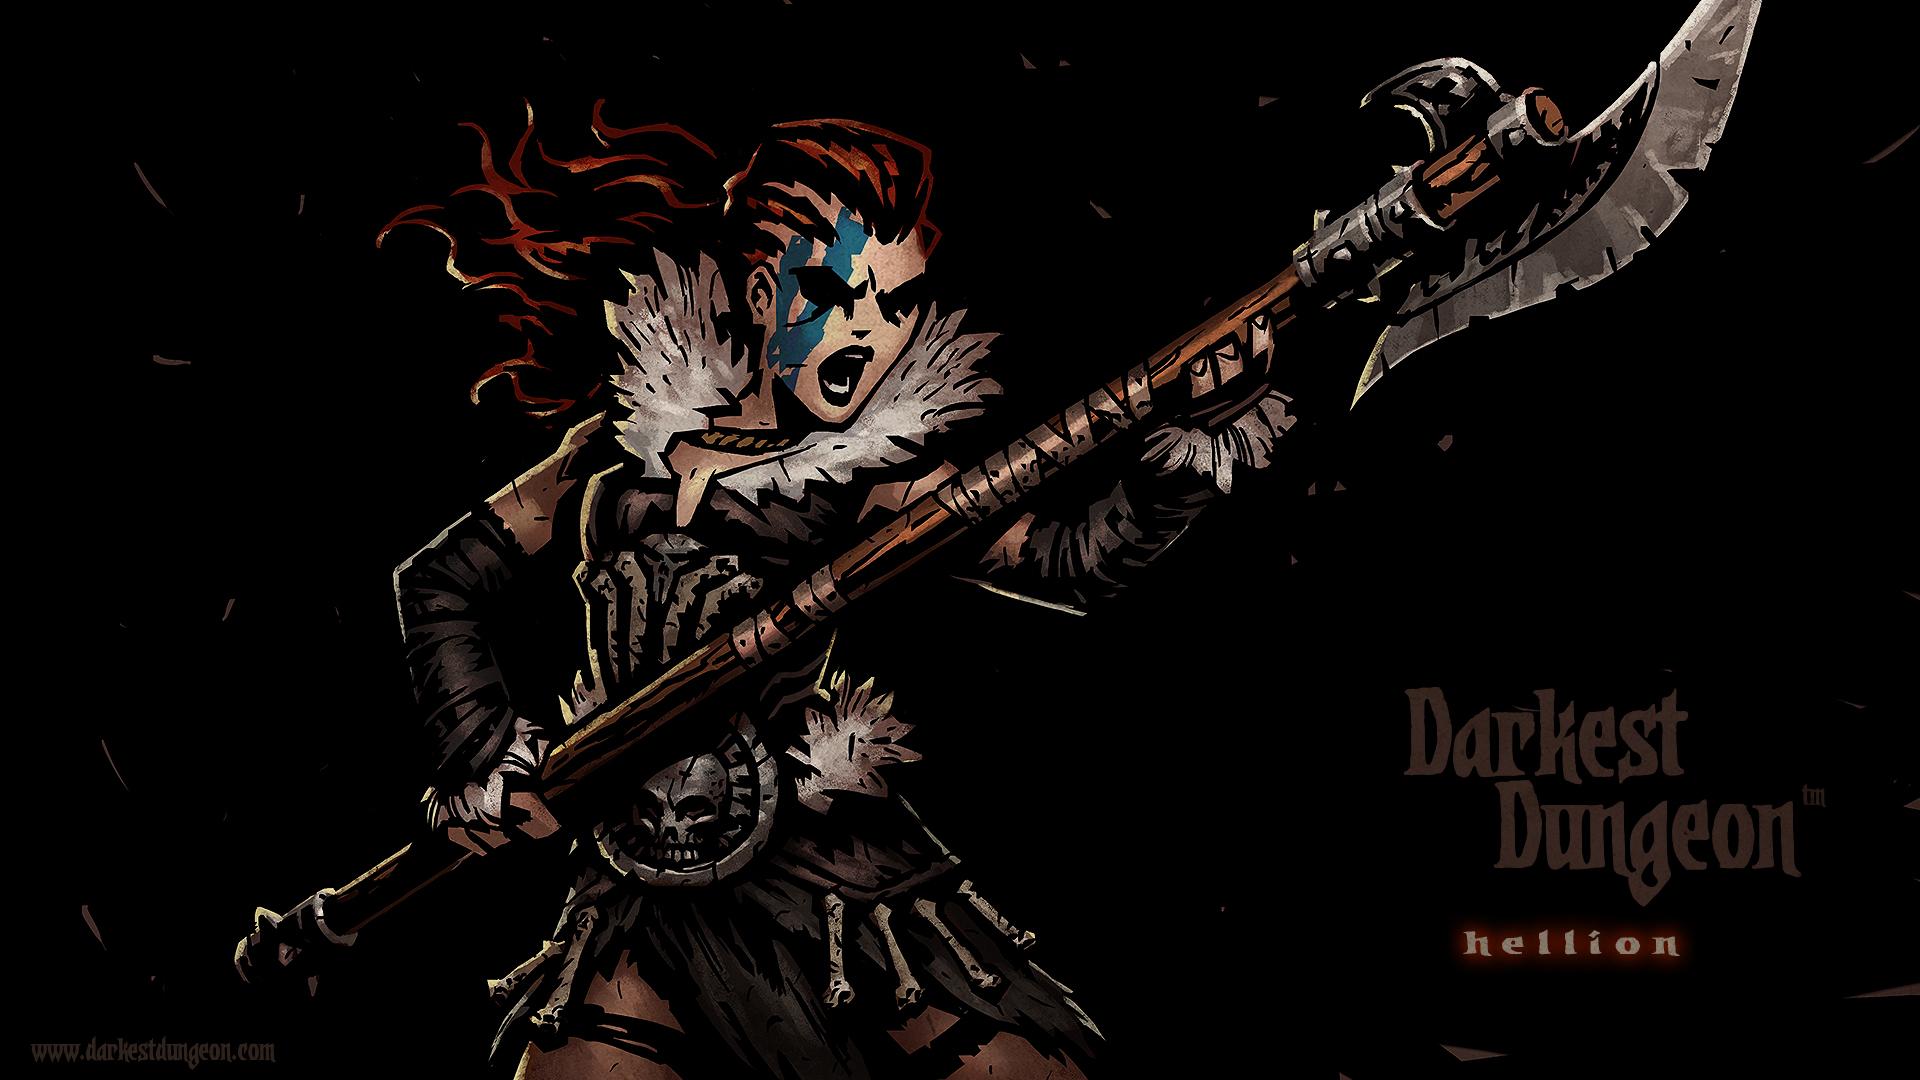 Реализованные, будущие, фанатские - Darkest Dungeon